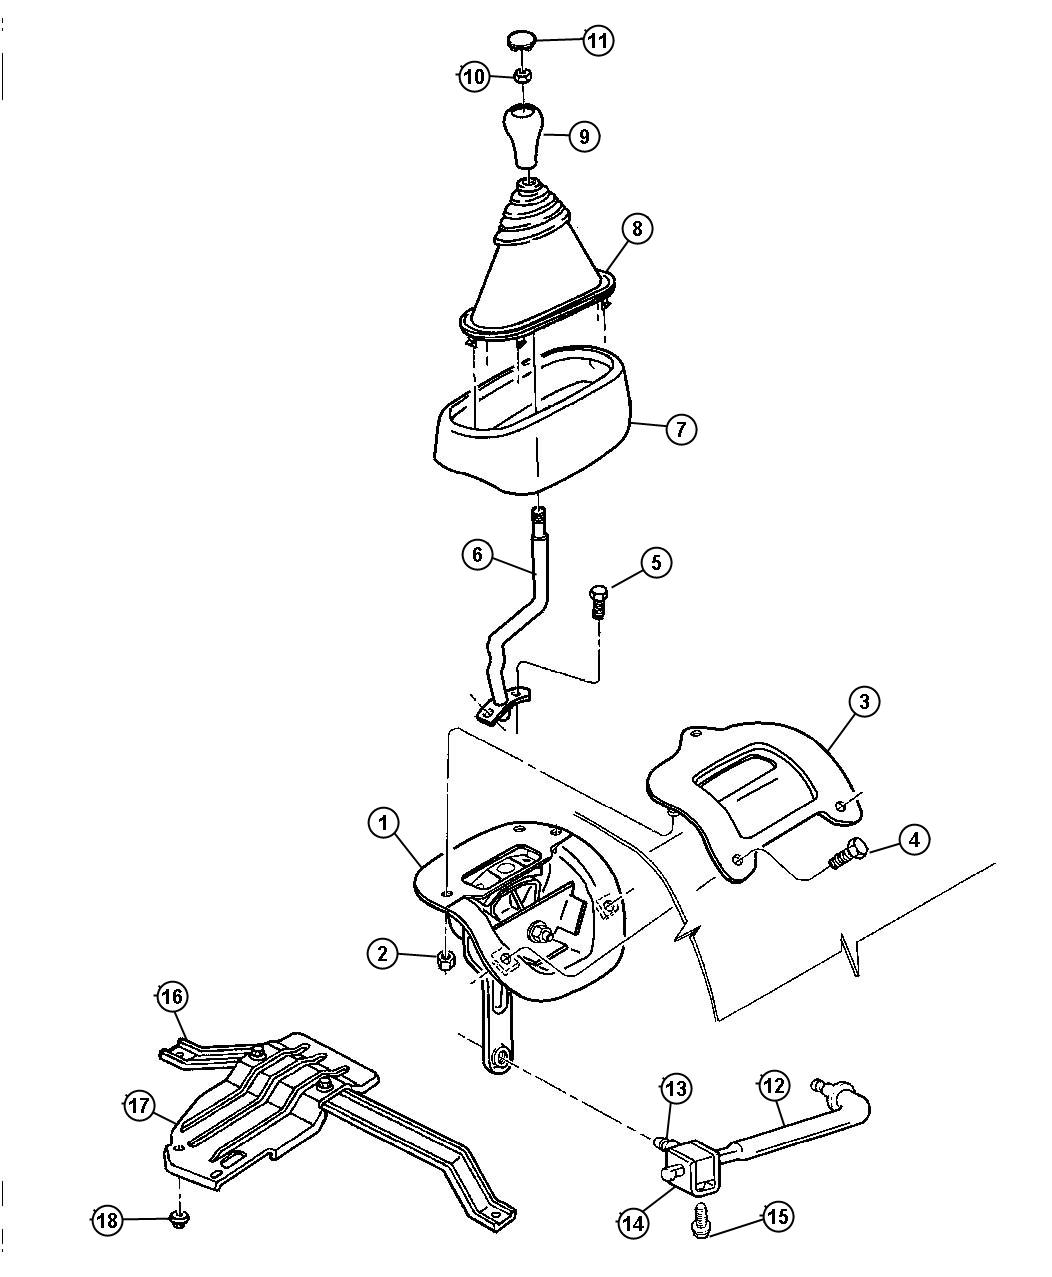 1998 Dodge Ram 1500 Controls, Transfer Case 231 [DHK]